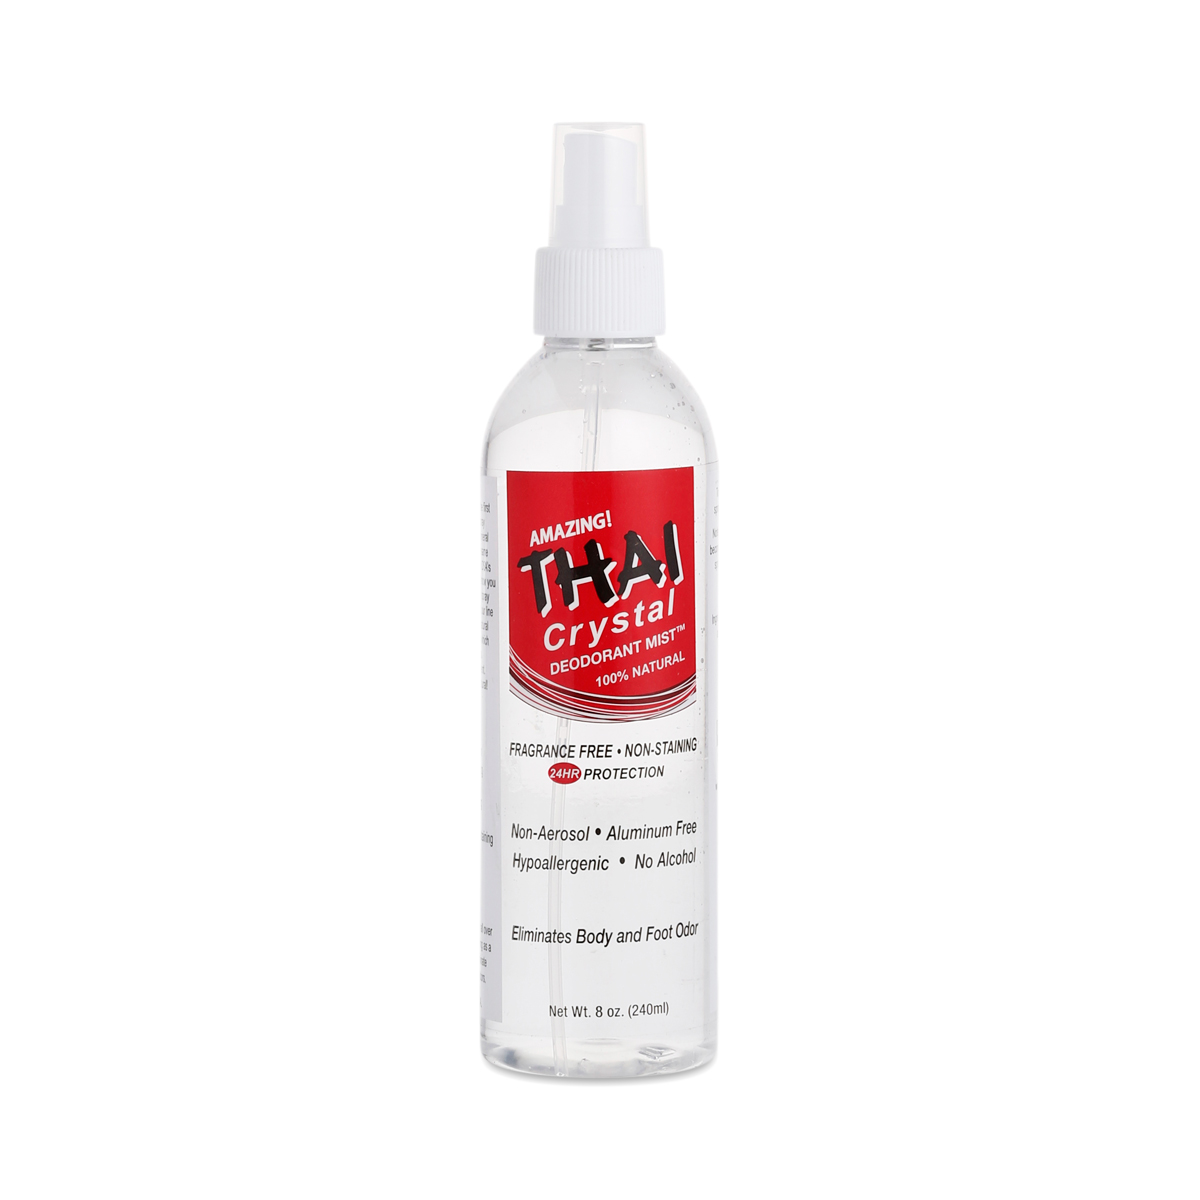 Deodorant Stones of America Thai Crystal Deodorant Mist Body Spray 8 oz bottle